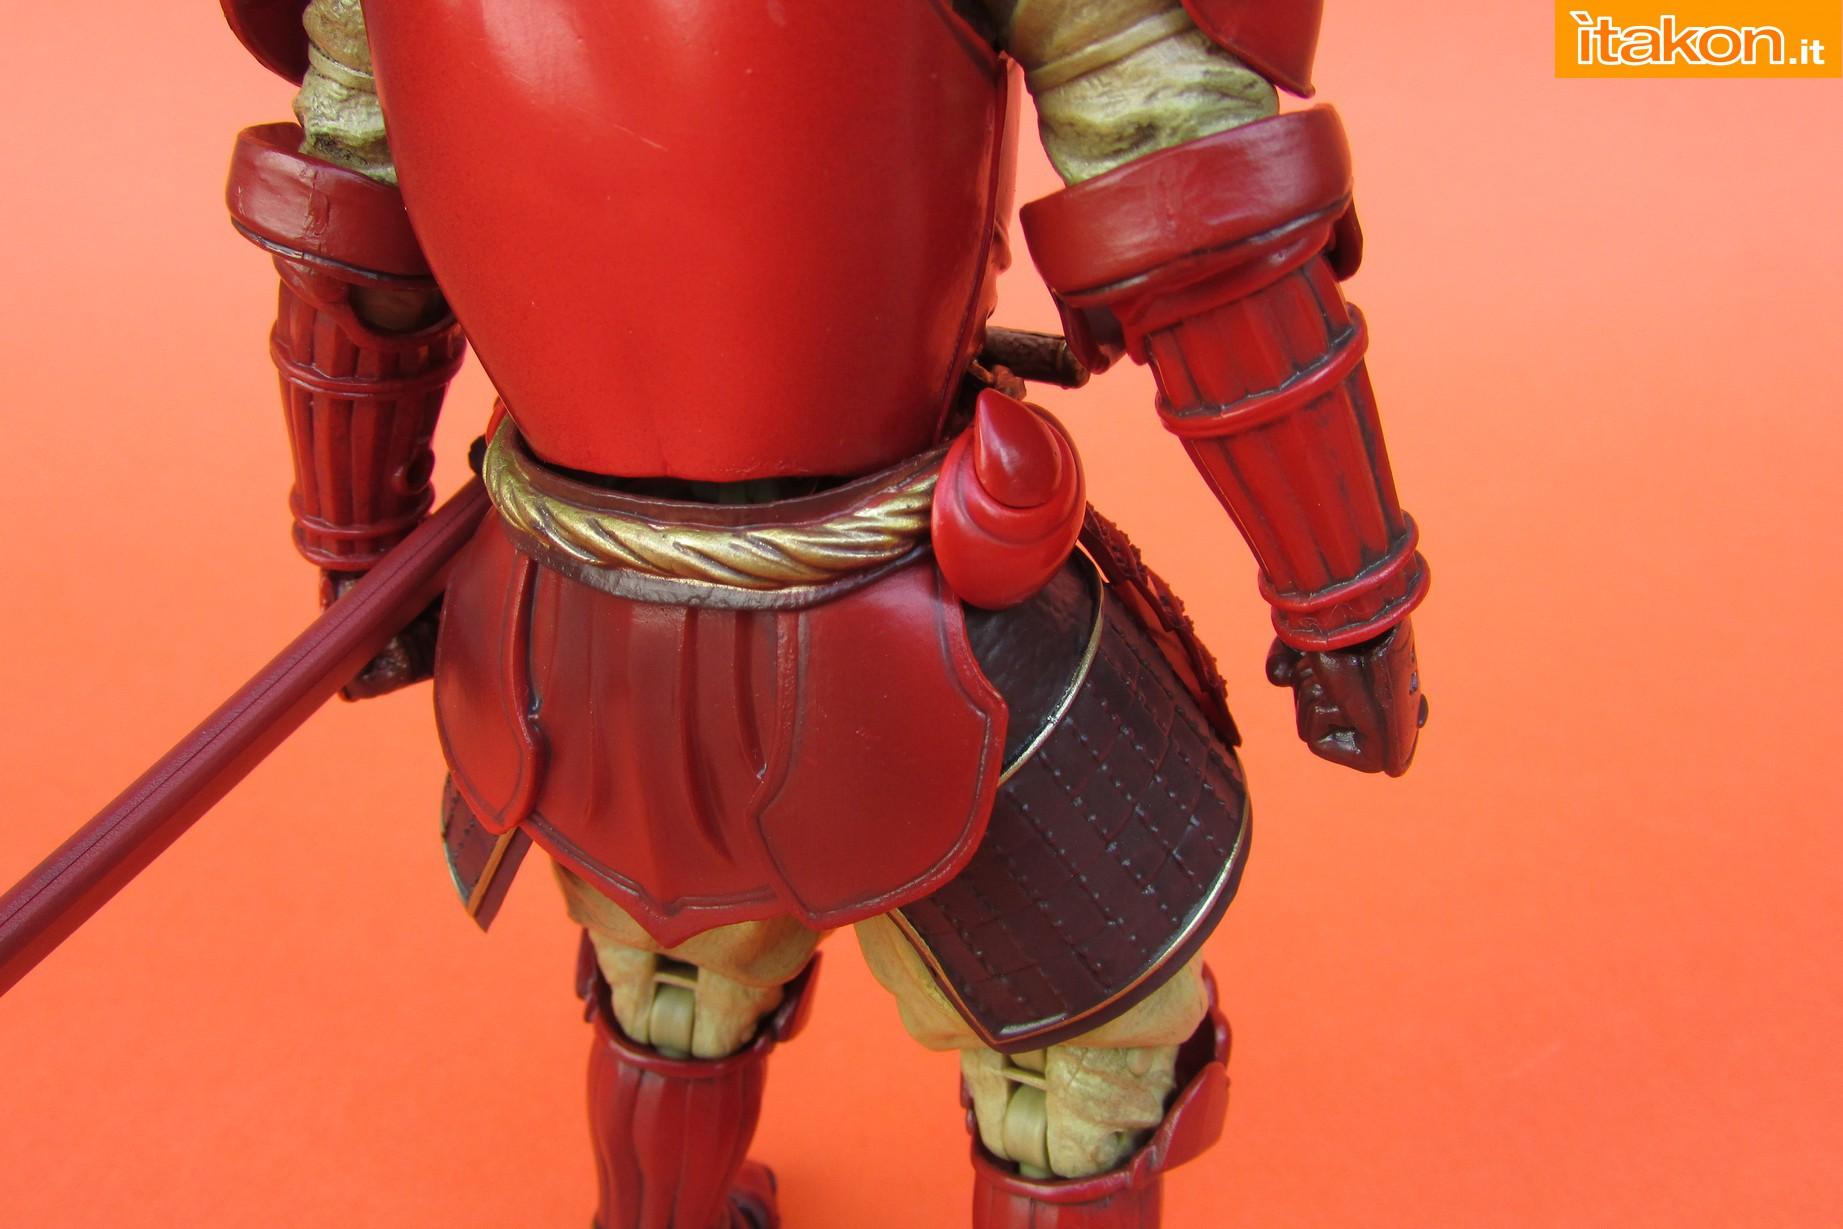 Link a Marvel Comics Koutetsu Samurai Iron Man Mark 3 Meishou MANGA REALIZATION review Bandai Itakon.it20